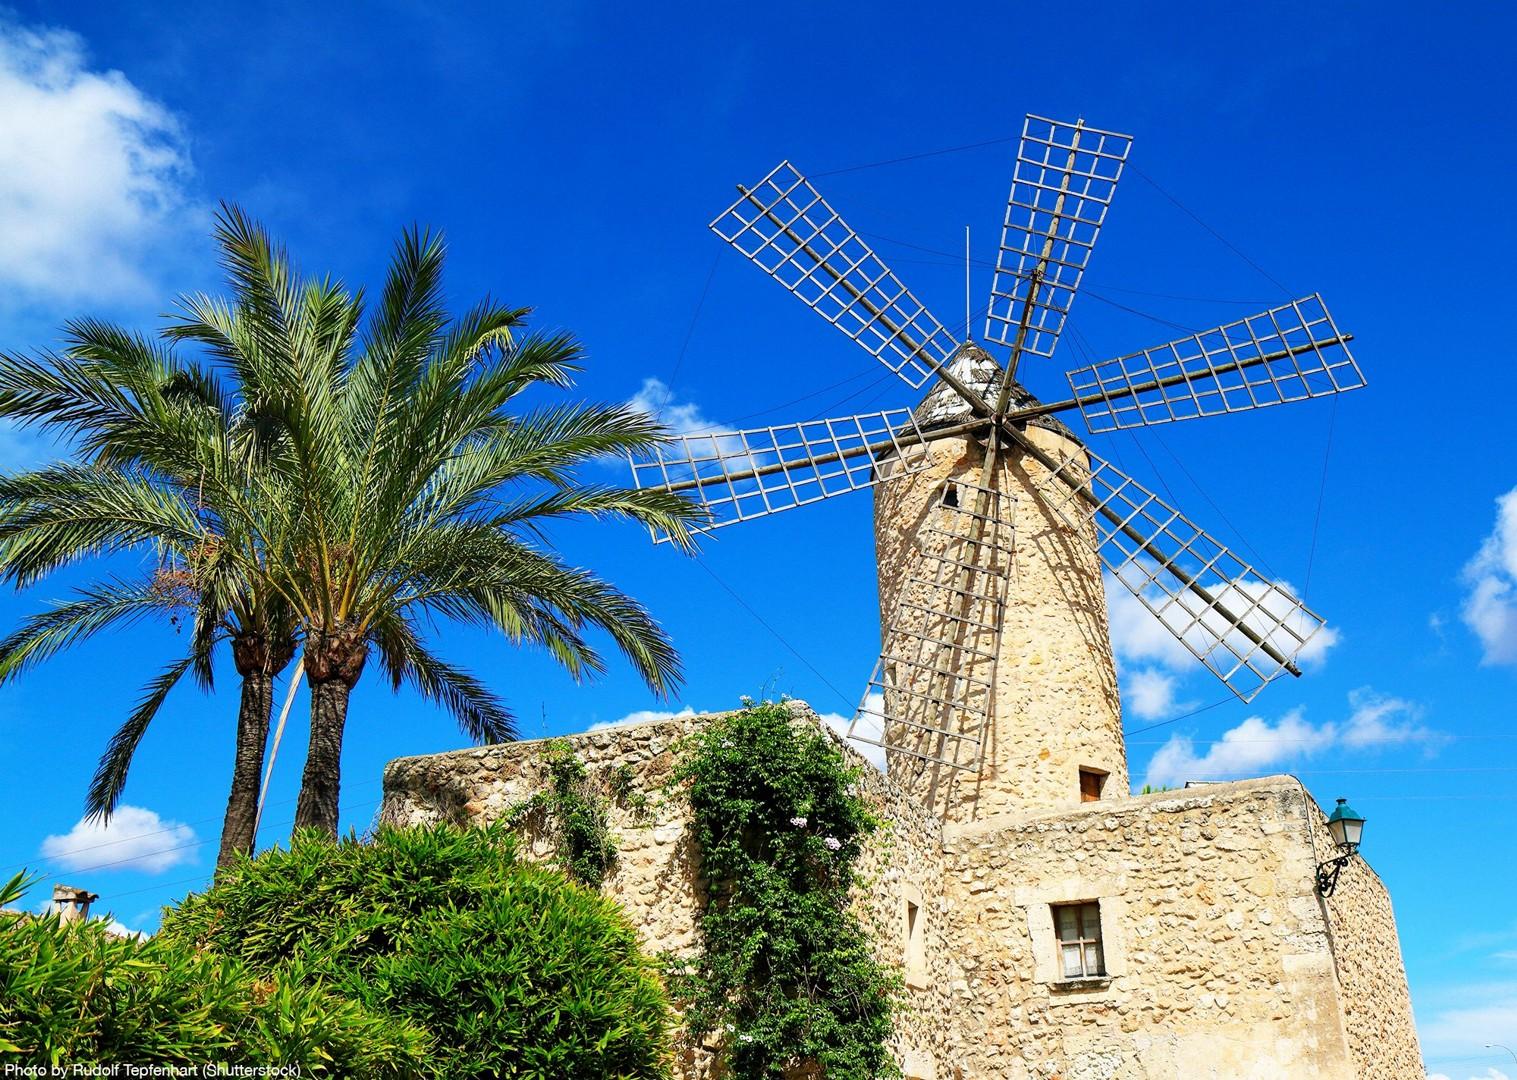 spanish-windmills-leisure-cycling-mediterranean-gentle-pace-mallorca.jpg - Spain - Mallorca - Self-Guided Leisure Cycling Holiday - Leisure Cycling